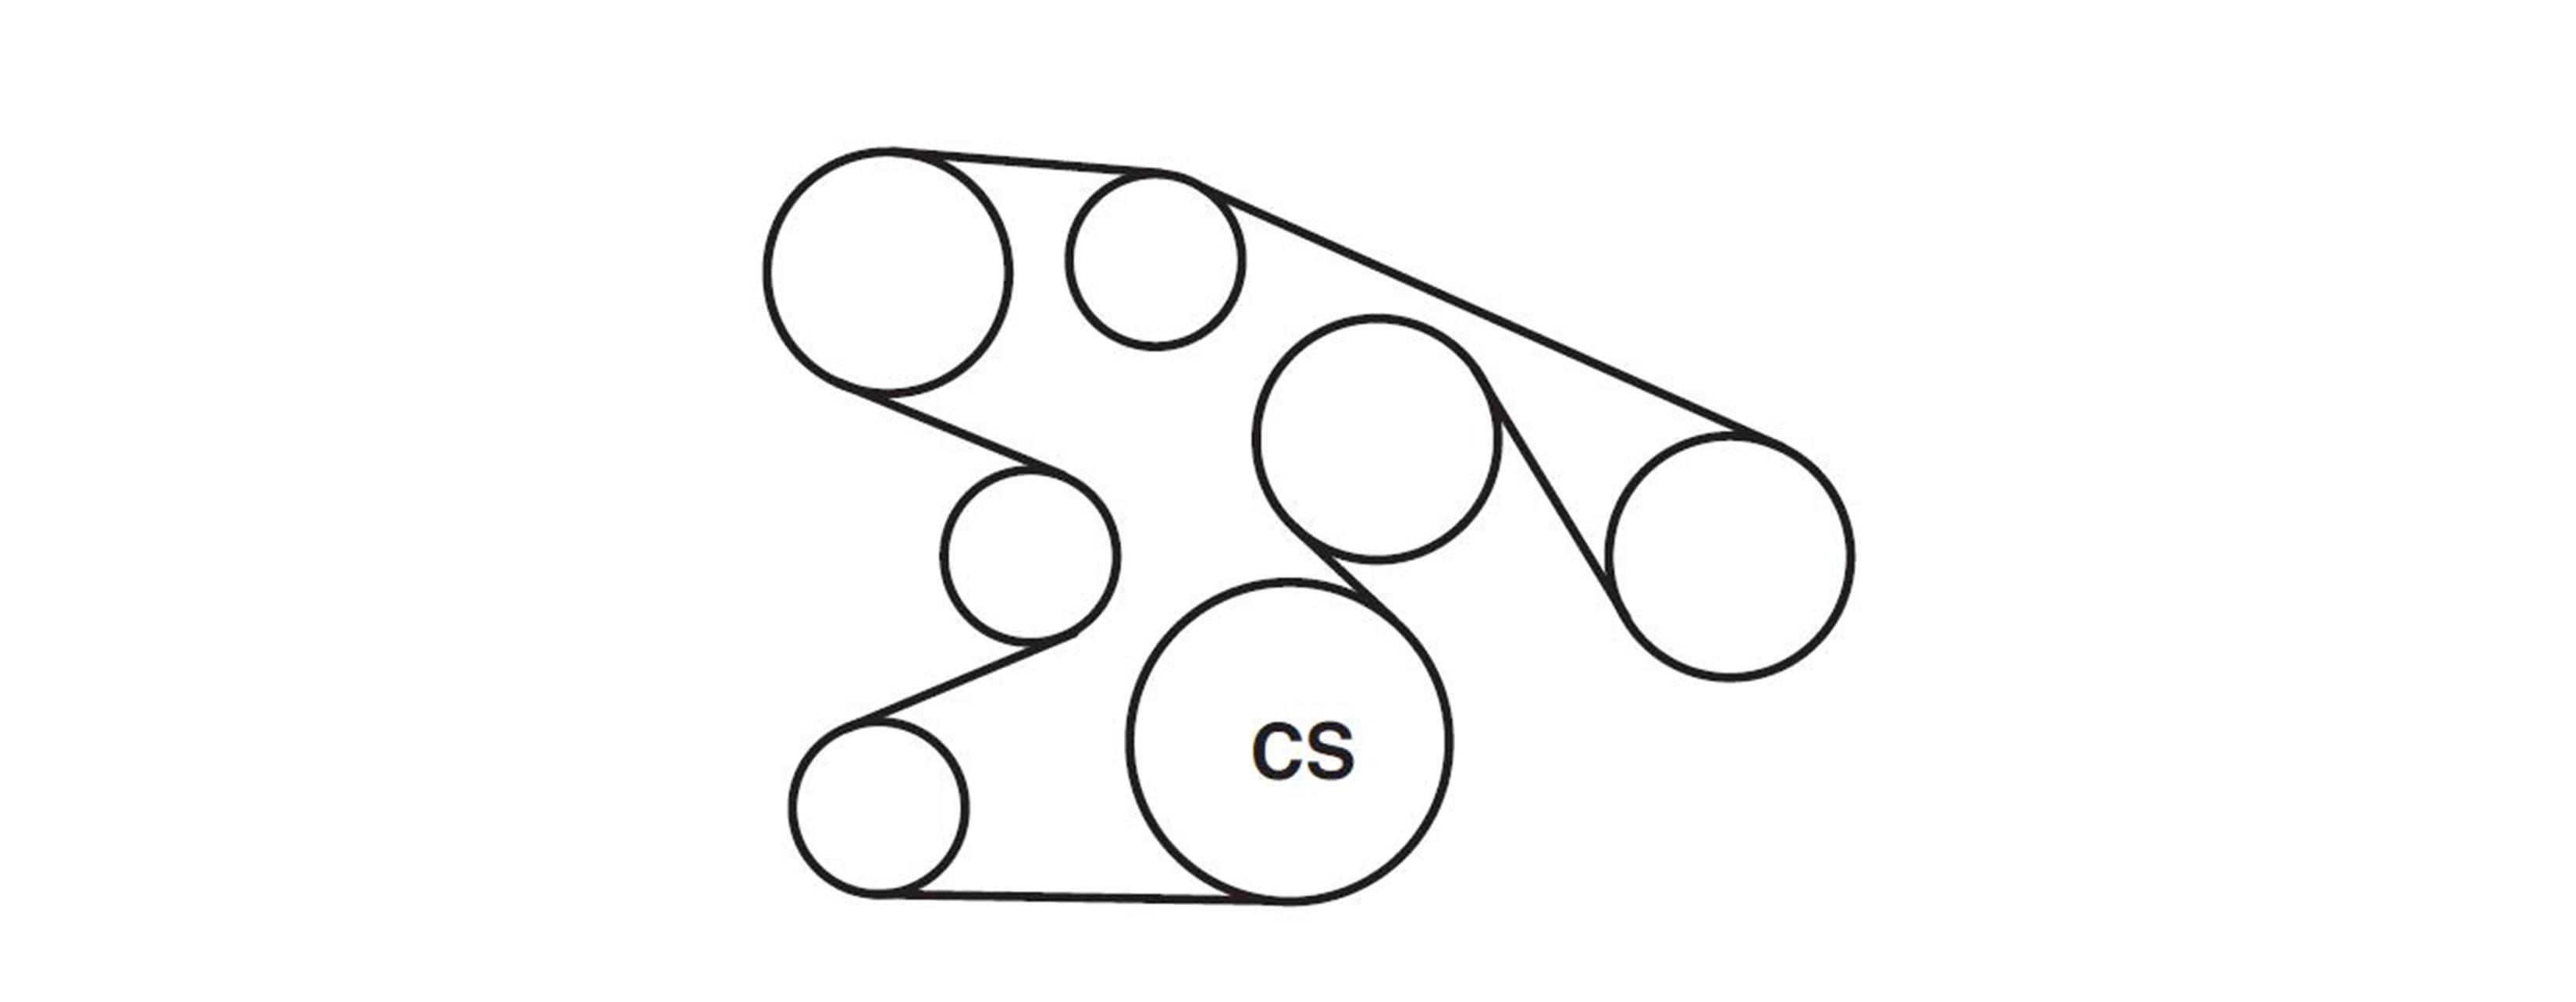 2008 Impala Serpentine Belt Diagram